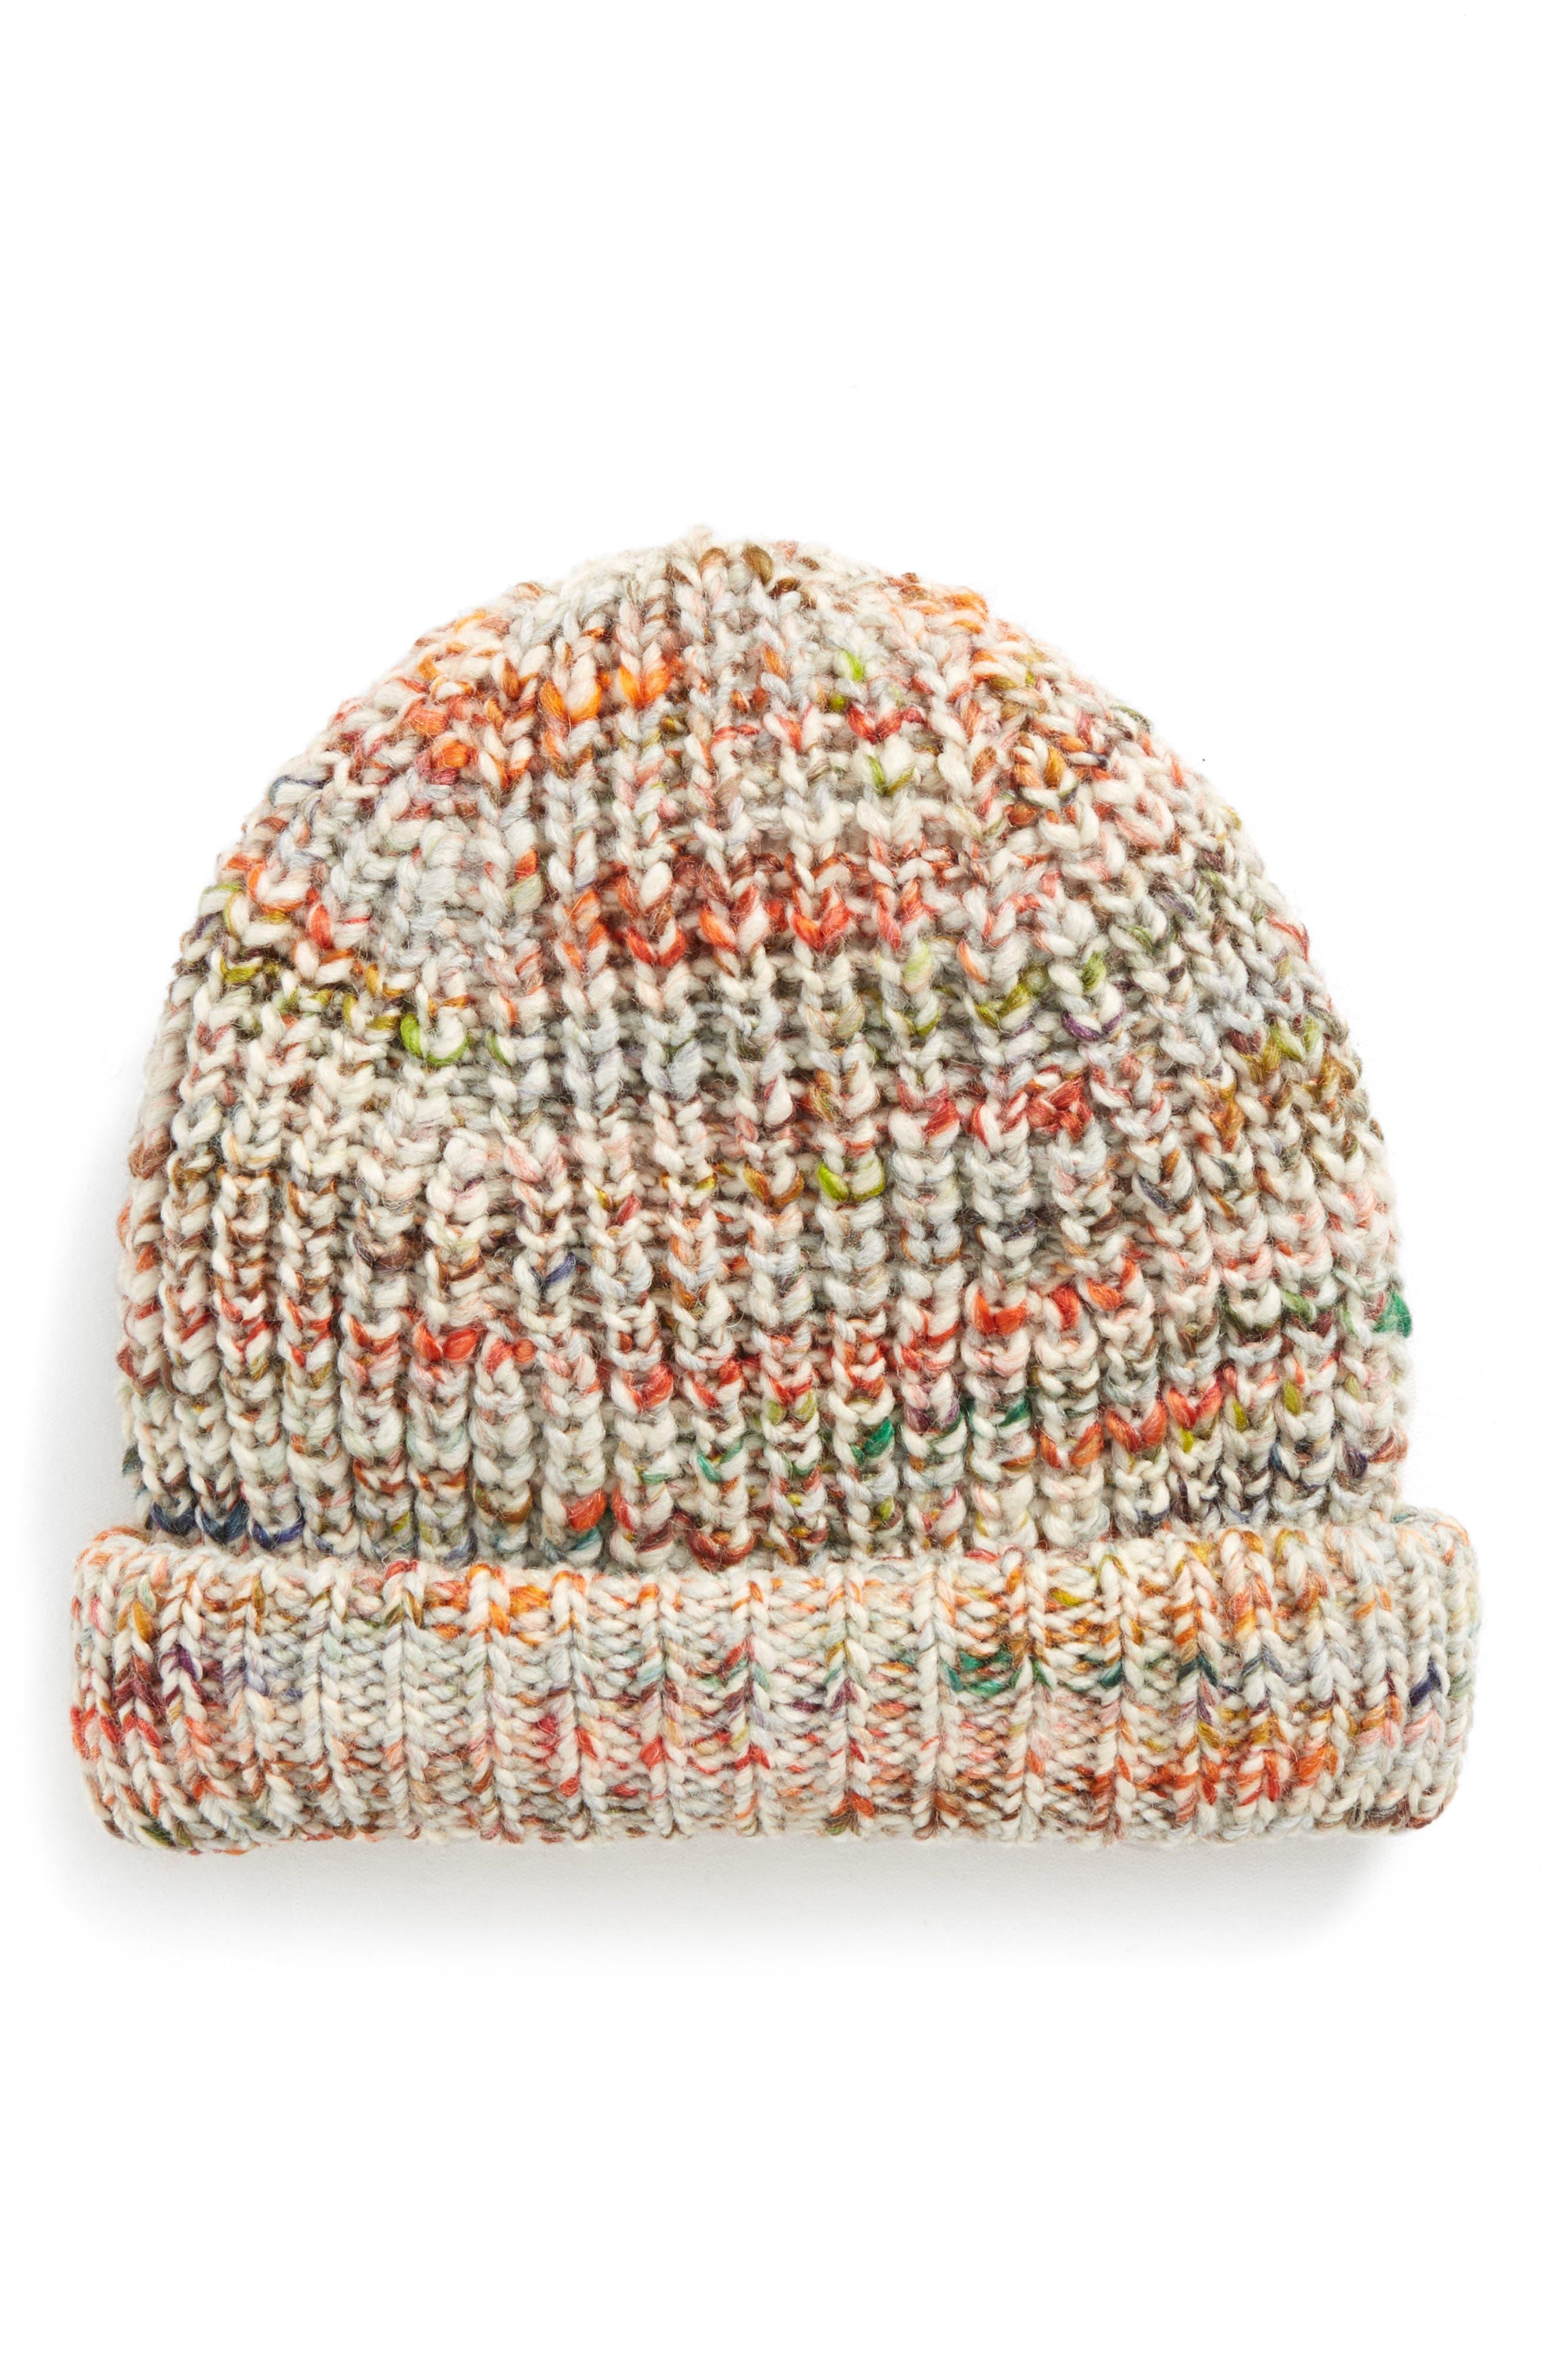 Zefir Knit Beanie,                         Main,                         color, White Mix